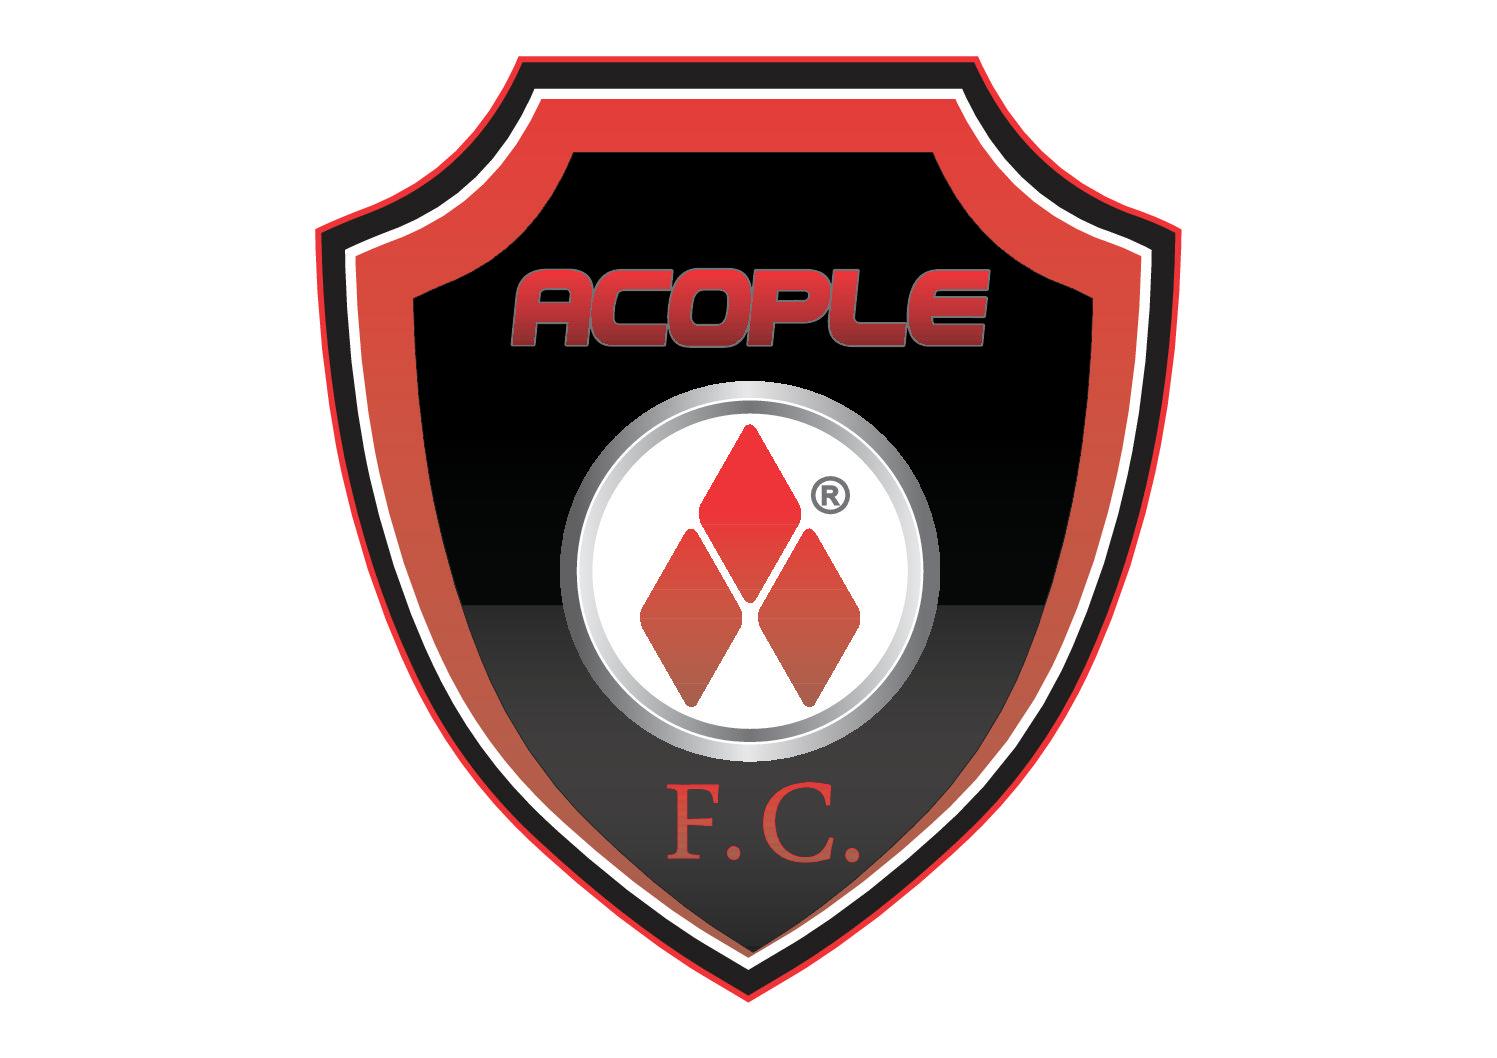 EQUIPE DA ACOPLE DE TAPERA/RS